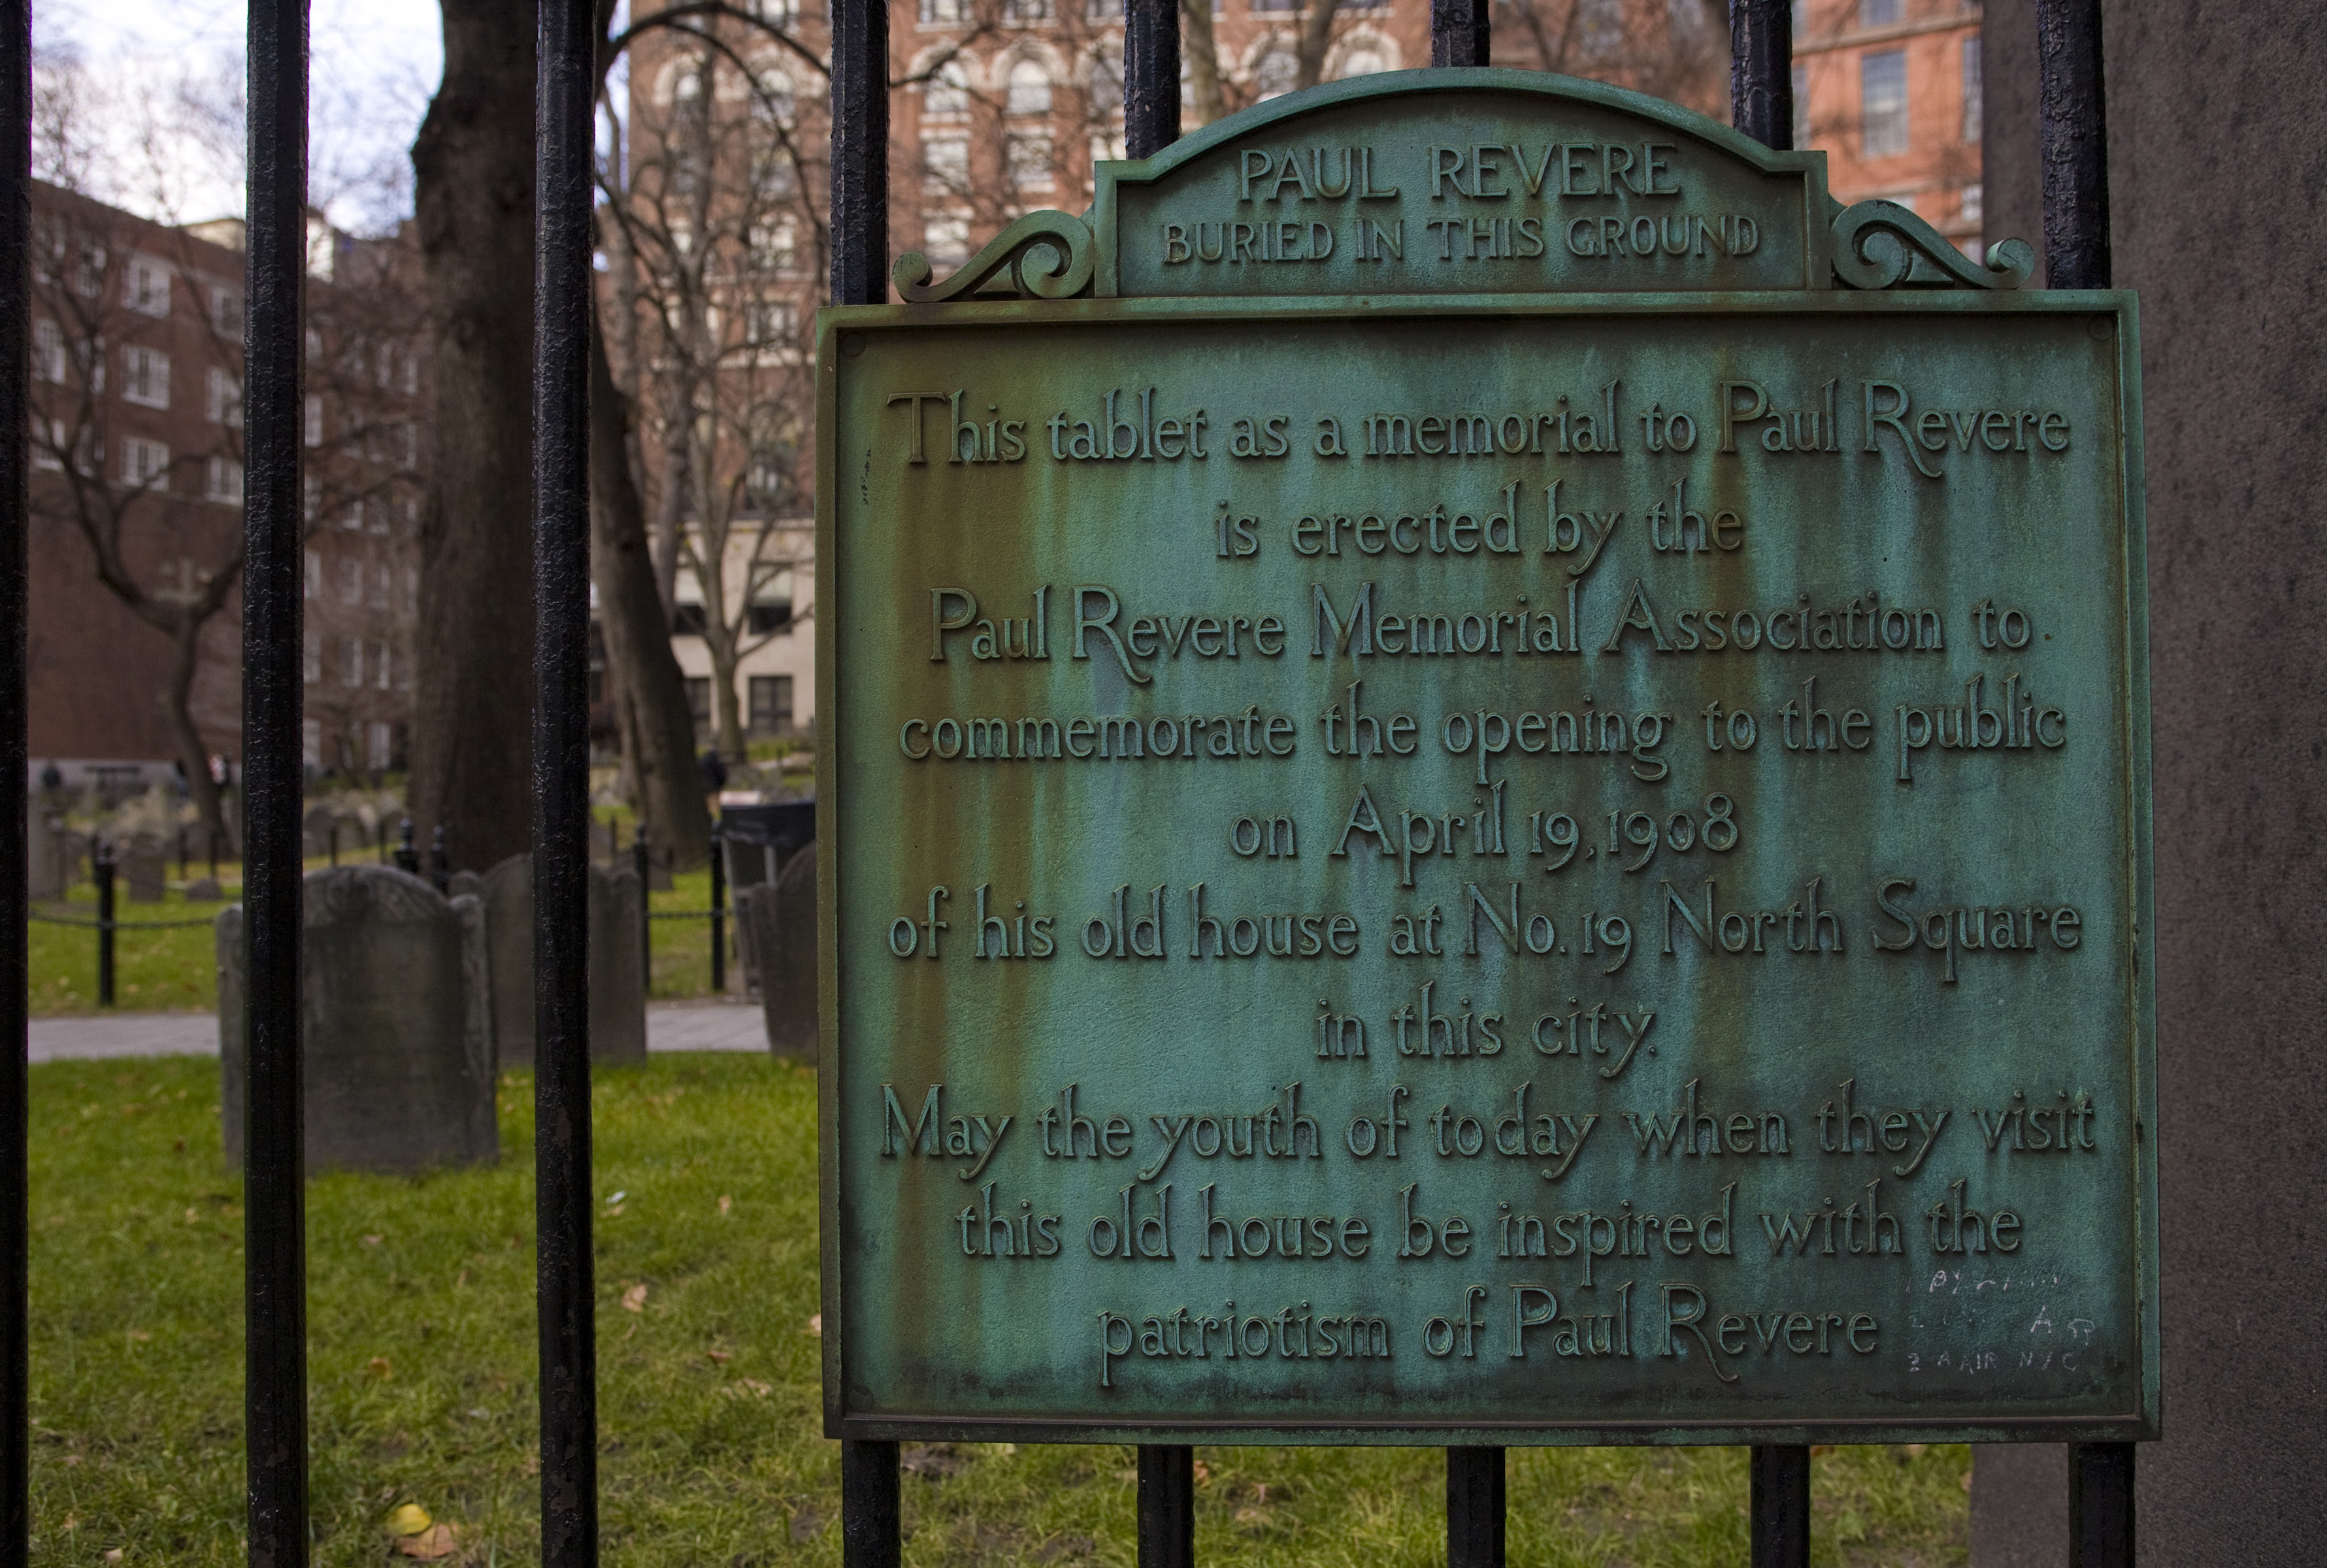 Paul Revere facts